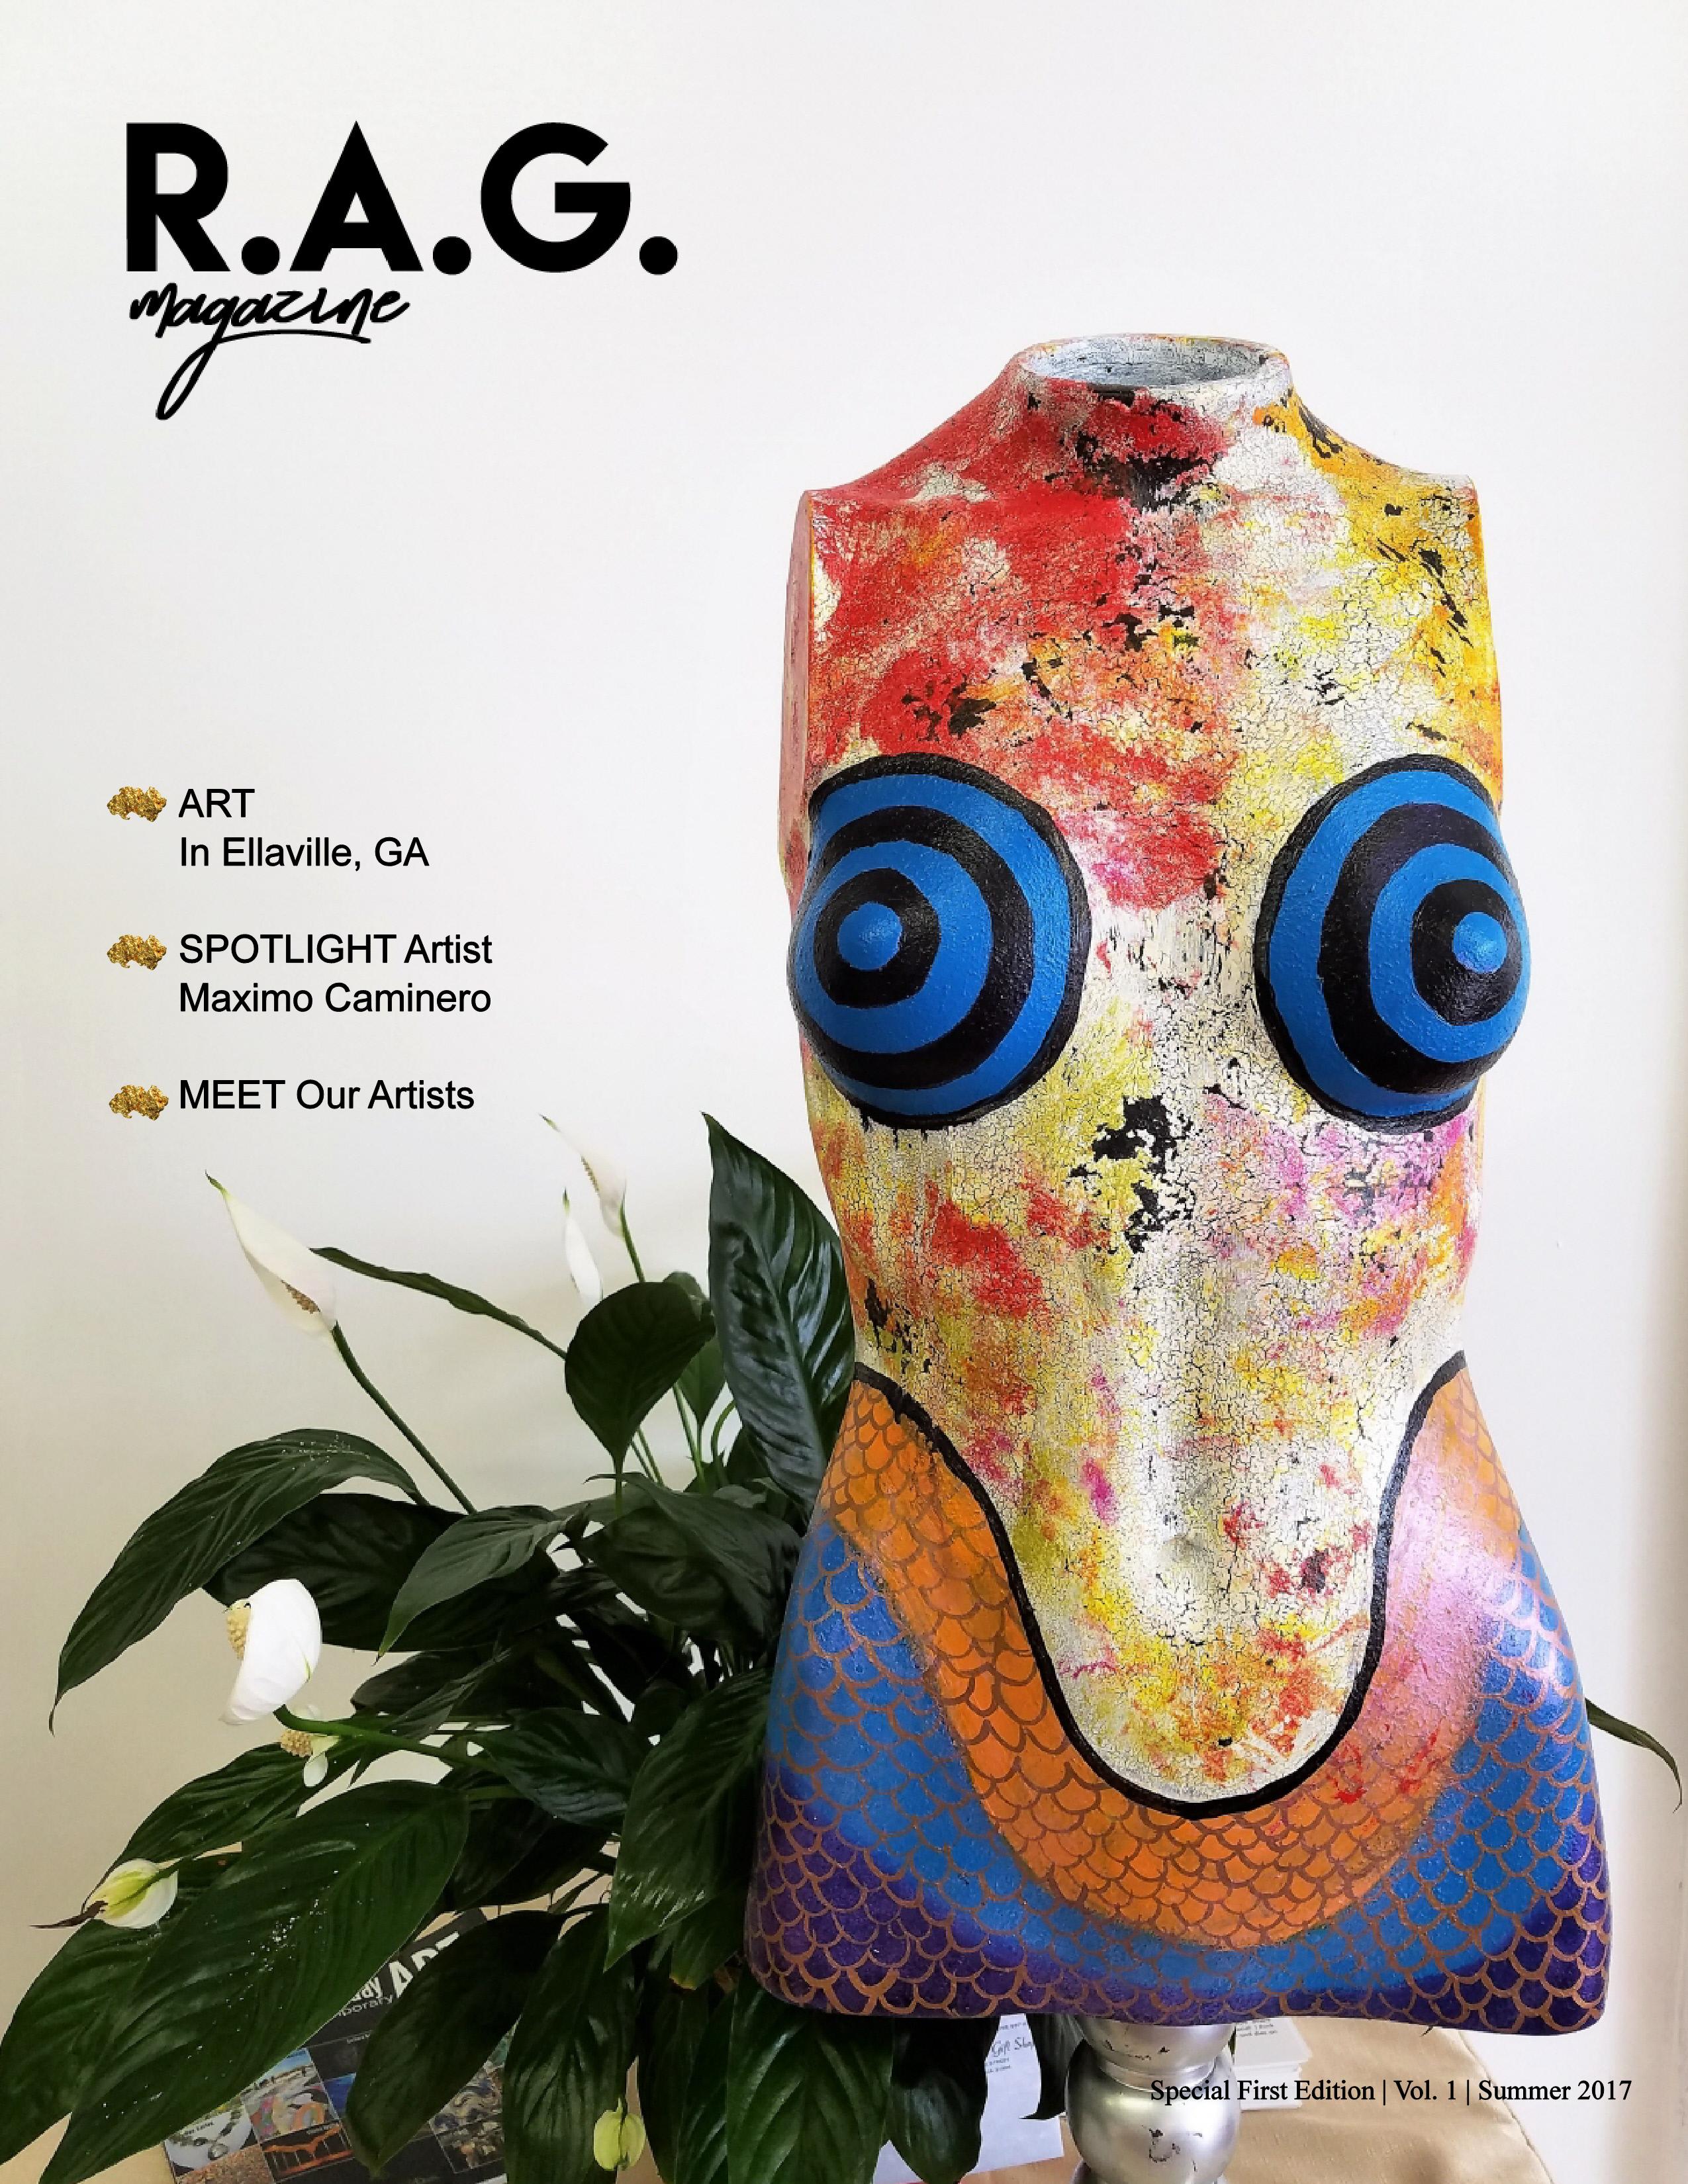 R.A.G. Magazine